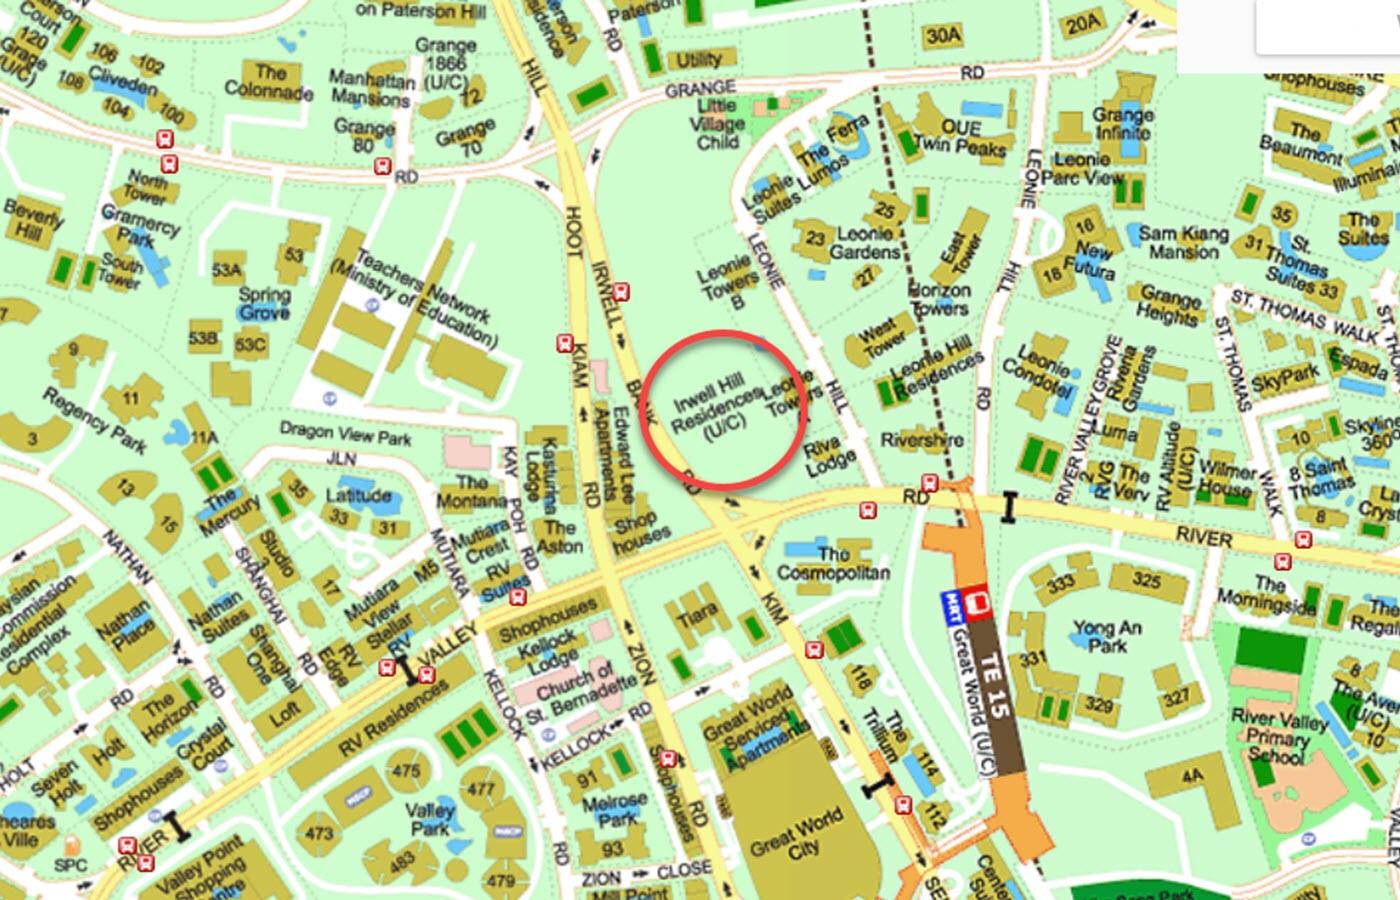 Irwell Hill Residences Condo Location - Street Directory Map